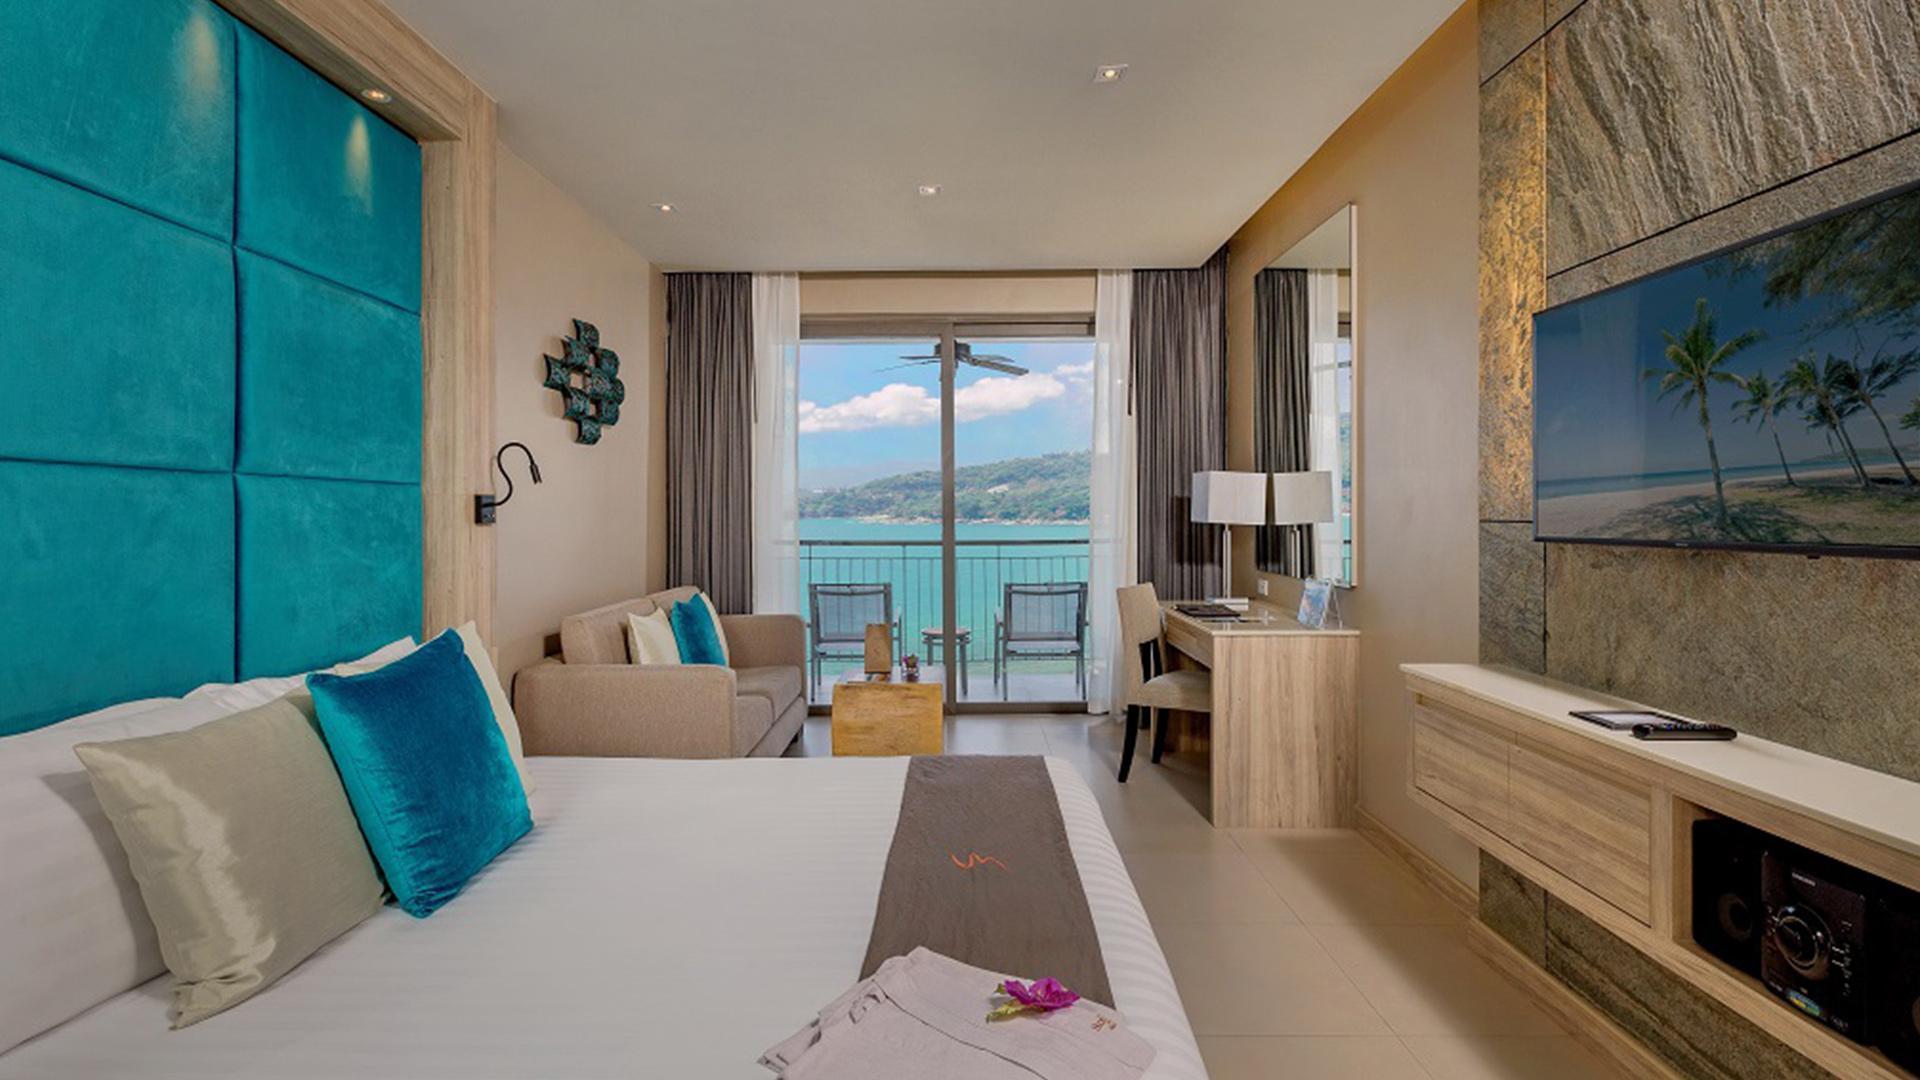 Sea View Deluxe Room image 1 at Cape Sienna Phuket Gourmet Hotel & Villas by Amphoe Kathu, Chang Wat Phuket, Thailand